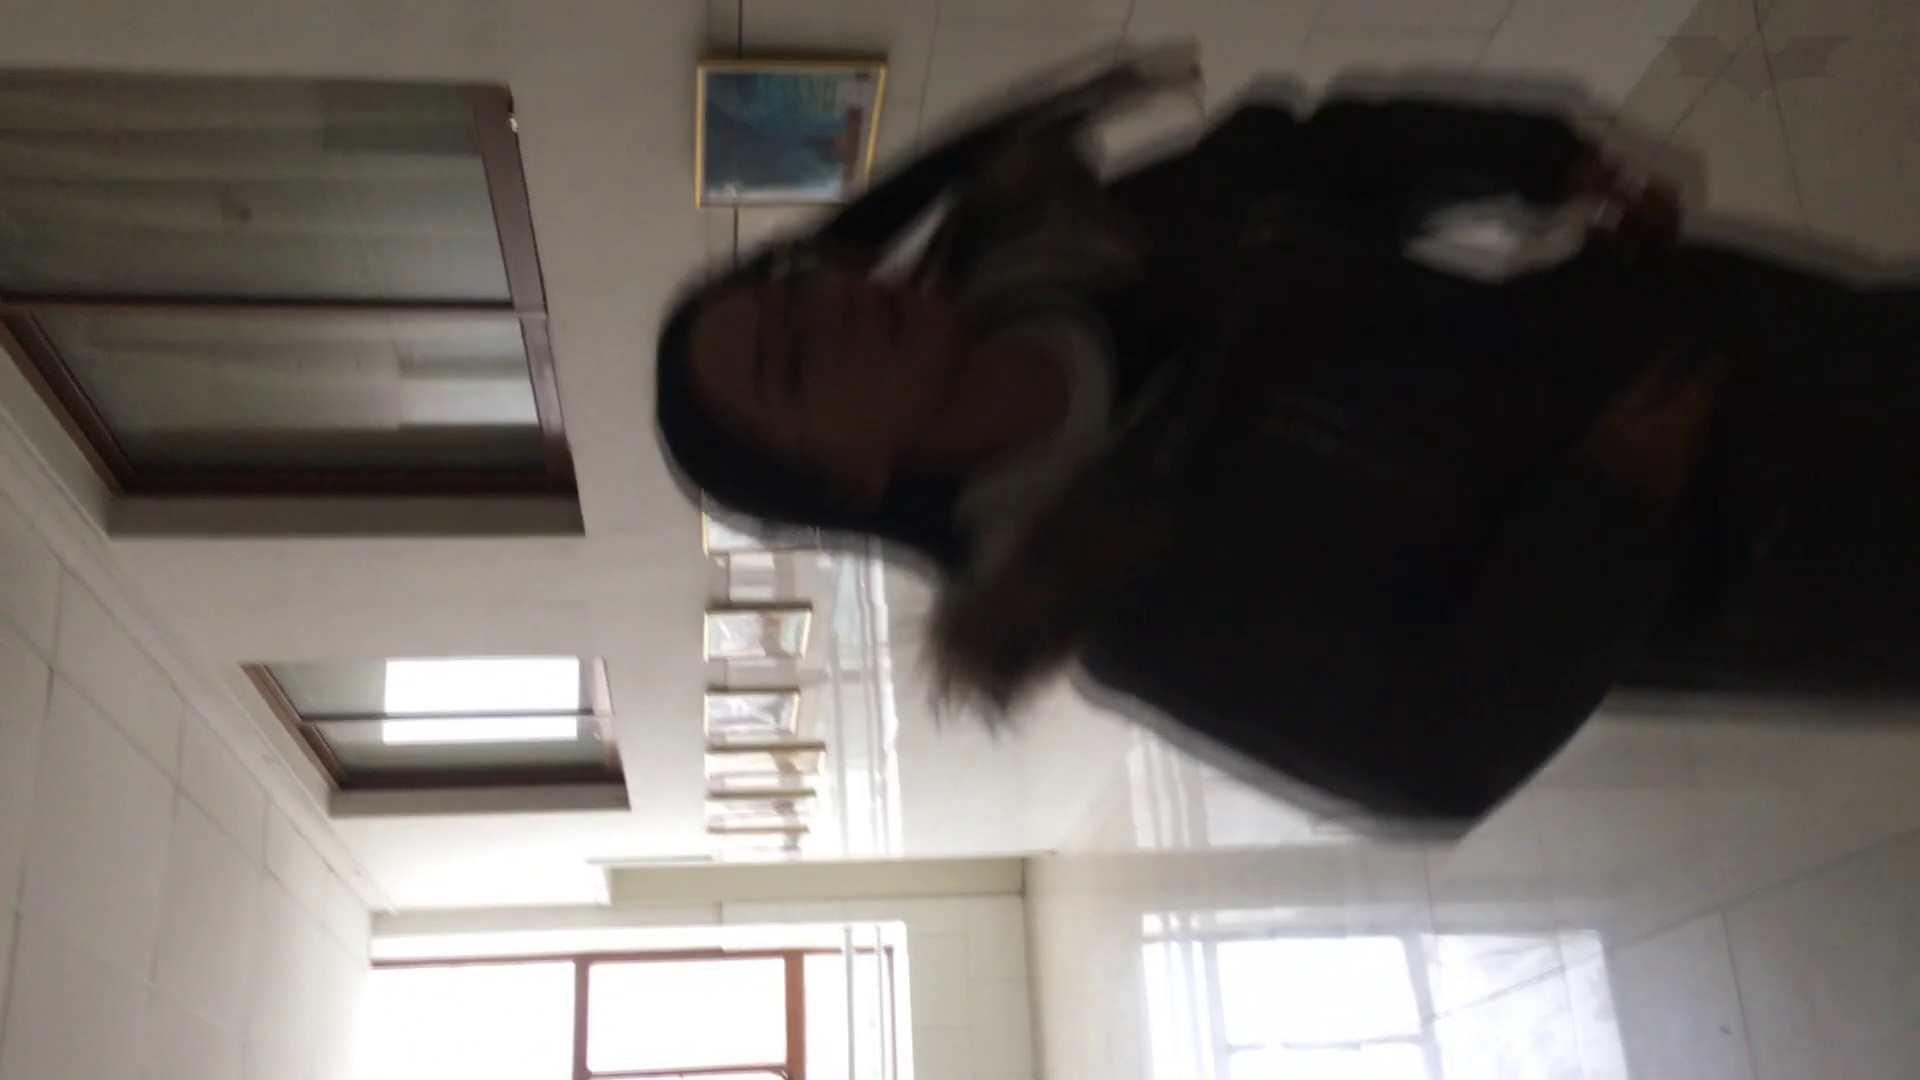 芸術大学ガチ潜入盗撮 JD盗撮 美女の洗面所の秘密 Vol.89 洗面所シーン オメコ無修正動画無料 36画像 30